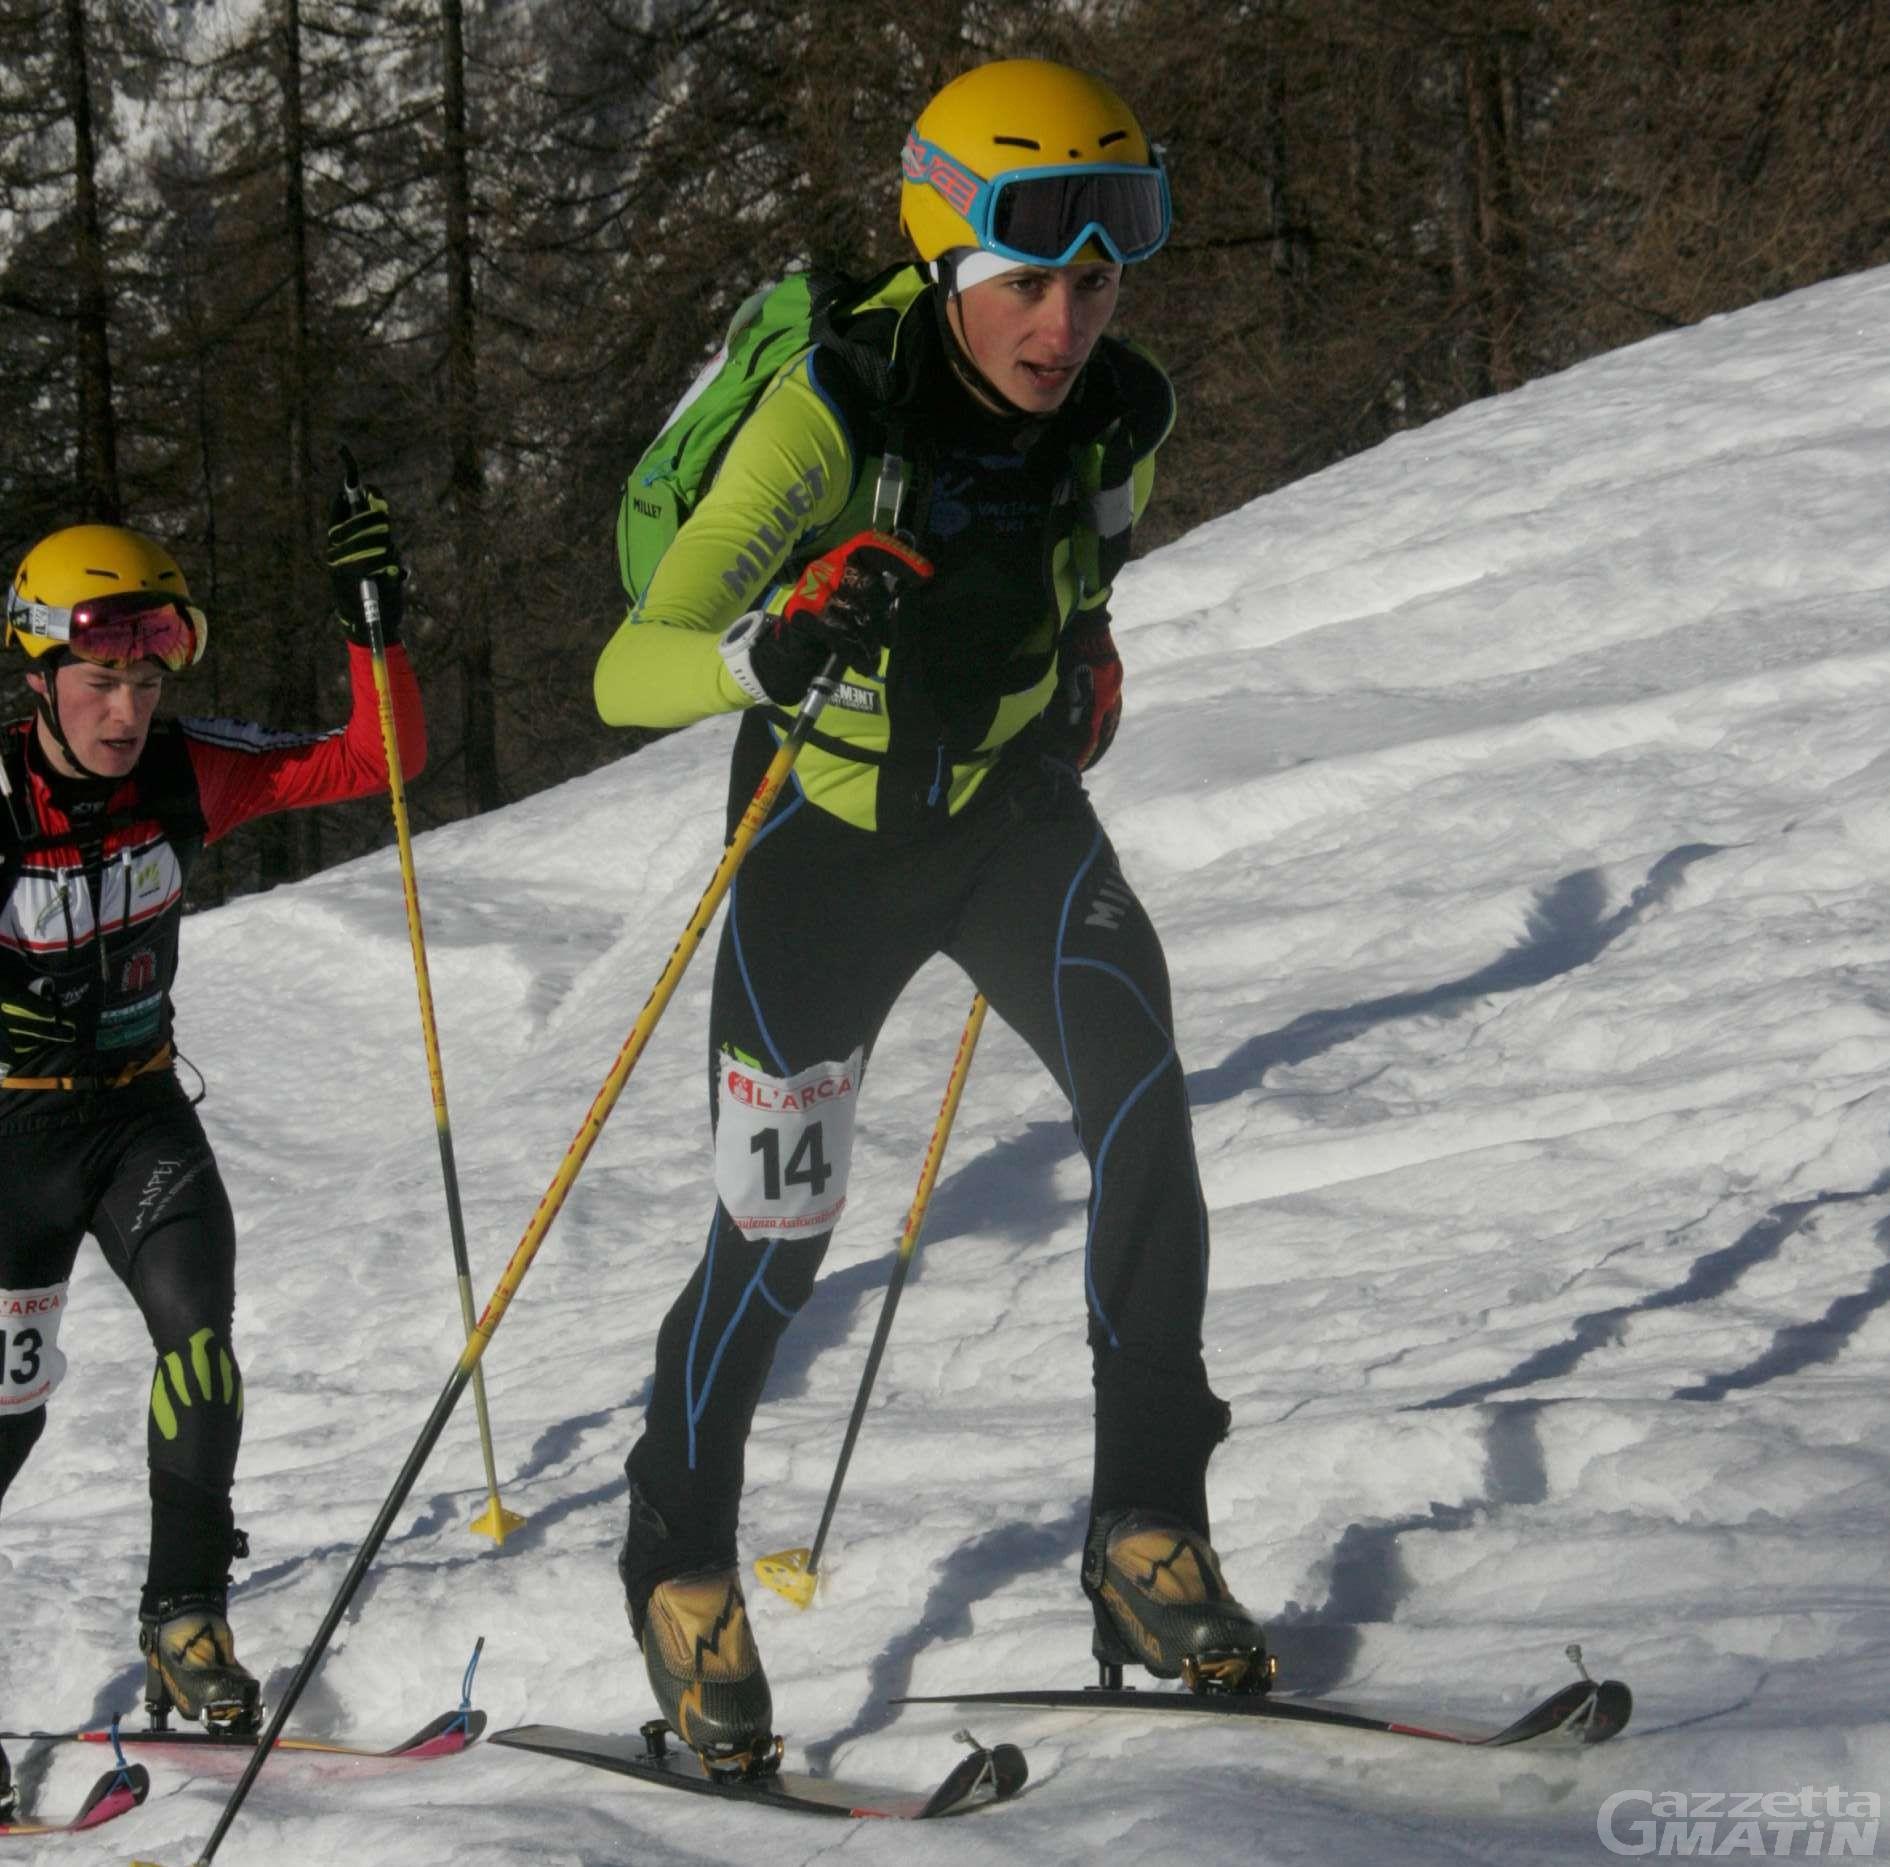 Scialpinismo: Fabien Guichardaz sul podio europeo